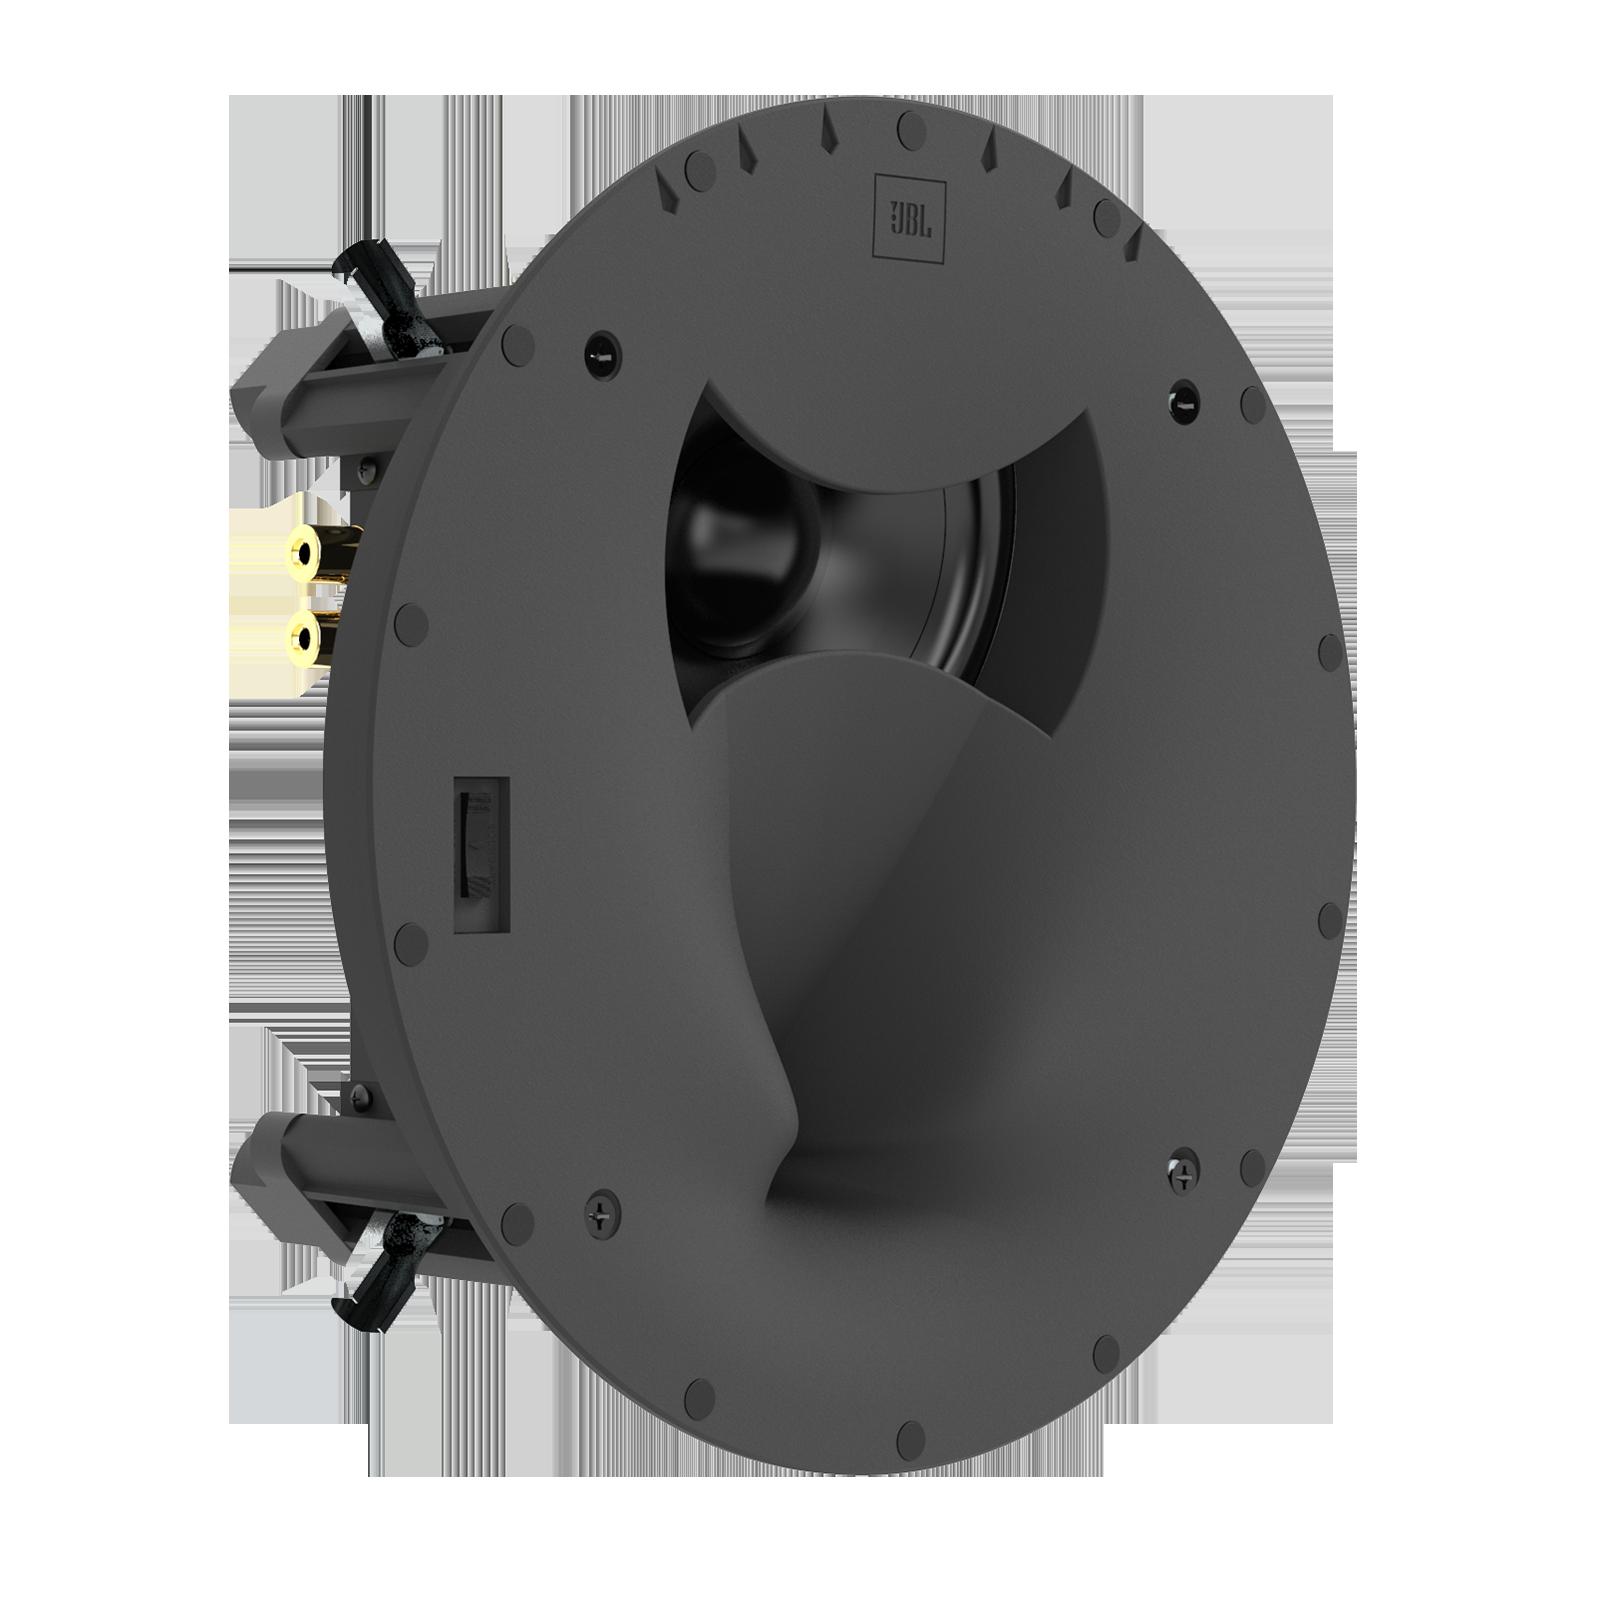 SCL-8 - Black - 2-Way 5.25-inch (130mm) In-Ceiling Loudspeaker - Front